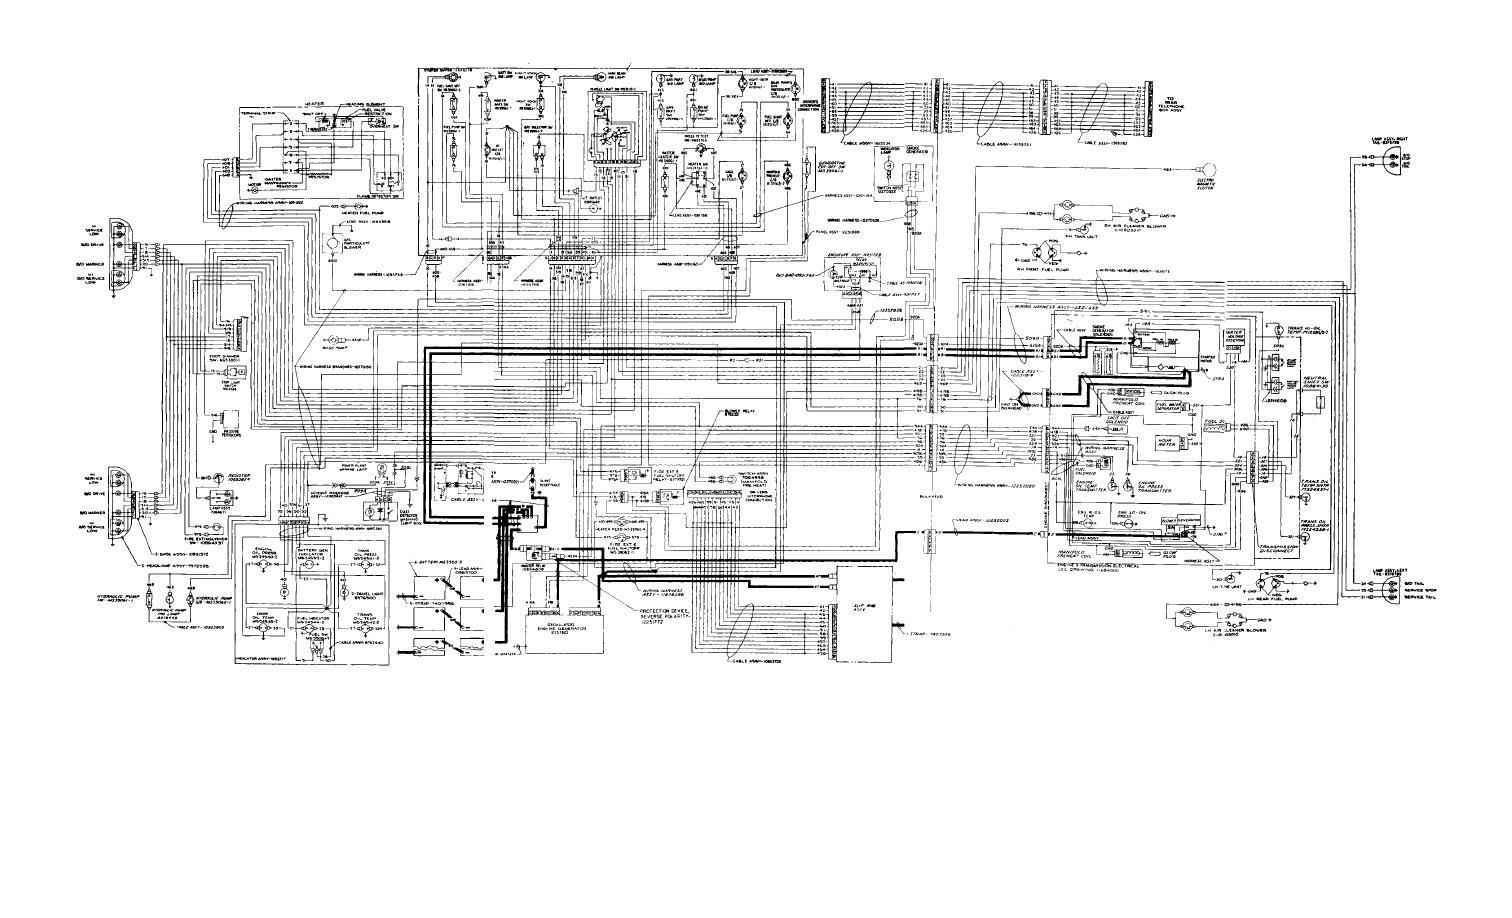 john deere 4240 starter wiring diagram 1980 jeep cj tractor solenoid ford 4000